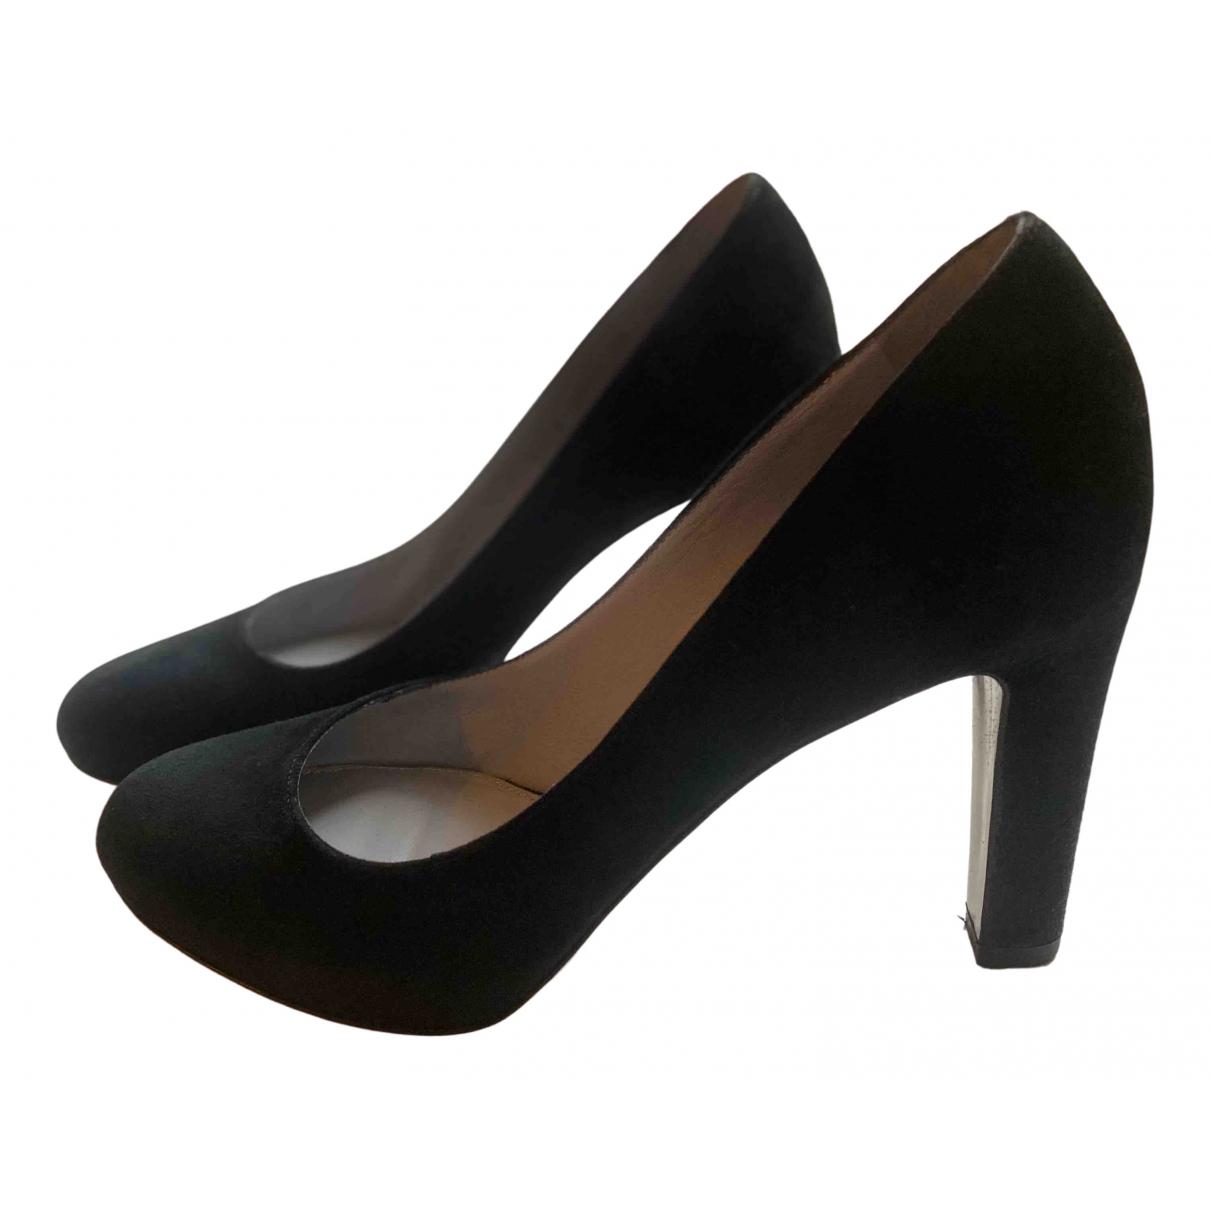 Sergio Rossi N Black Suede Heels for Women 36 EU